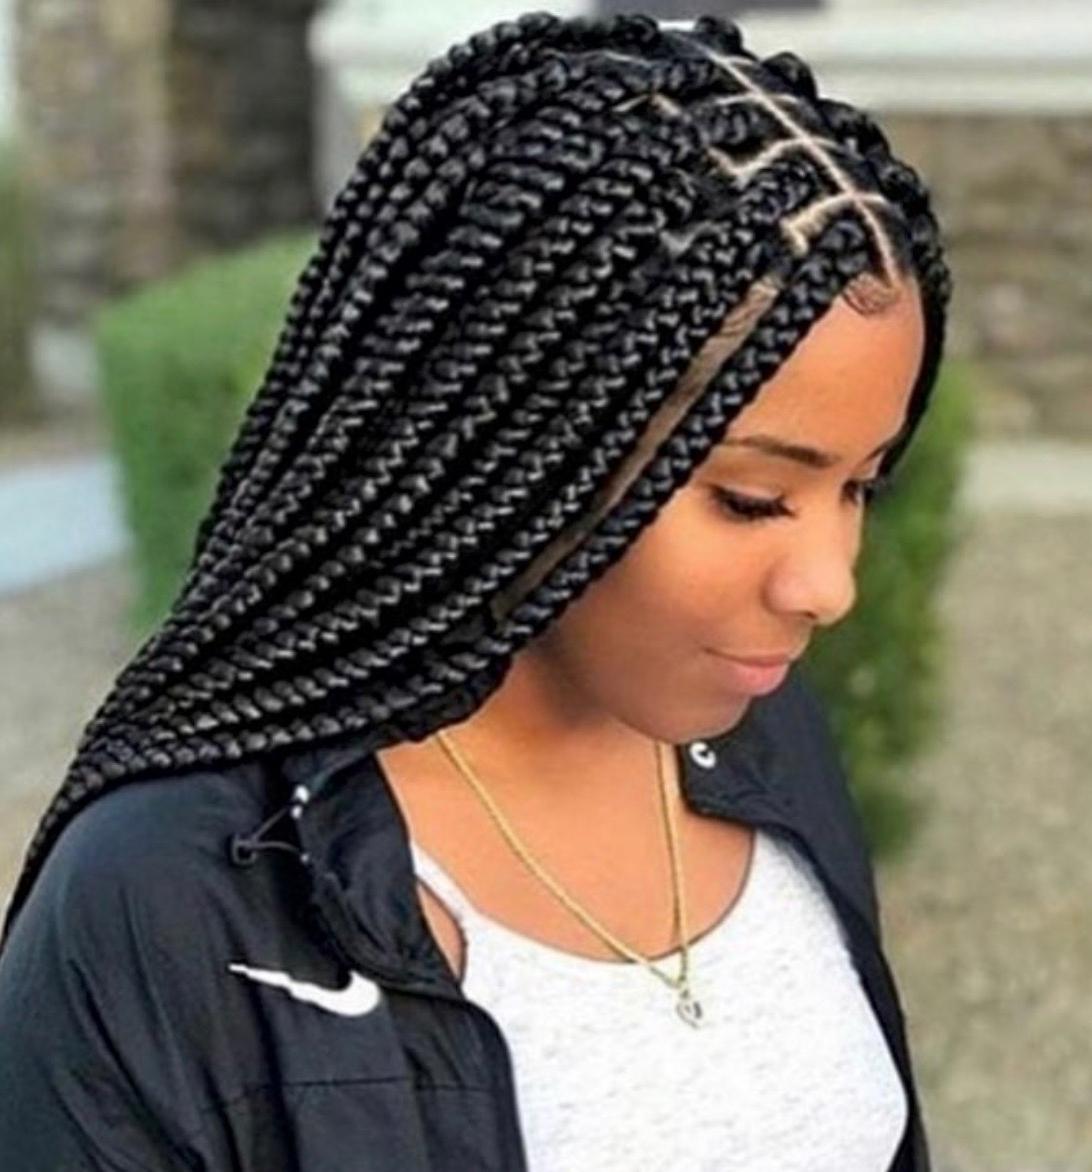 Braid Hairstyles 2018 – 40 Ghana Braid, Box Braid, Goddess Braid In Fashionable Medium Cornrows Hairstyles (View 14 of 15)